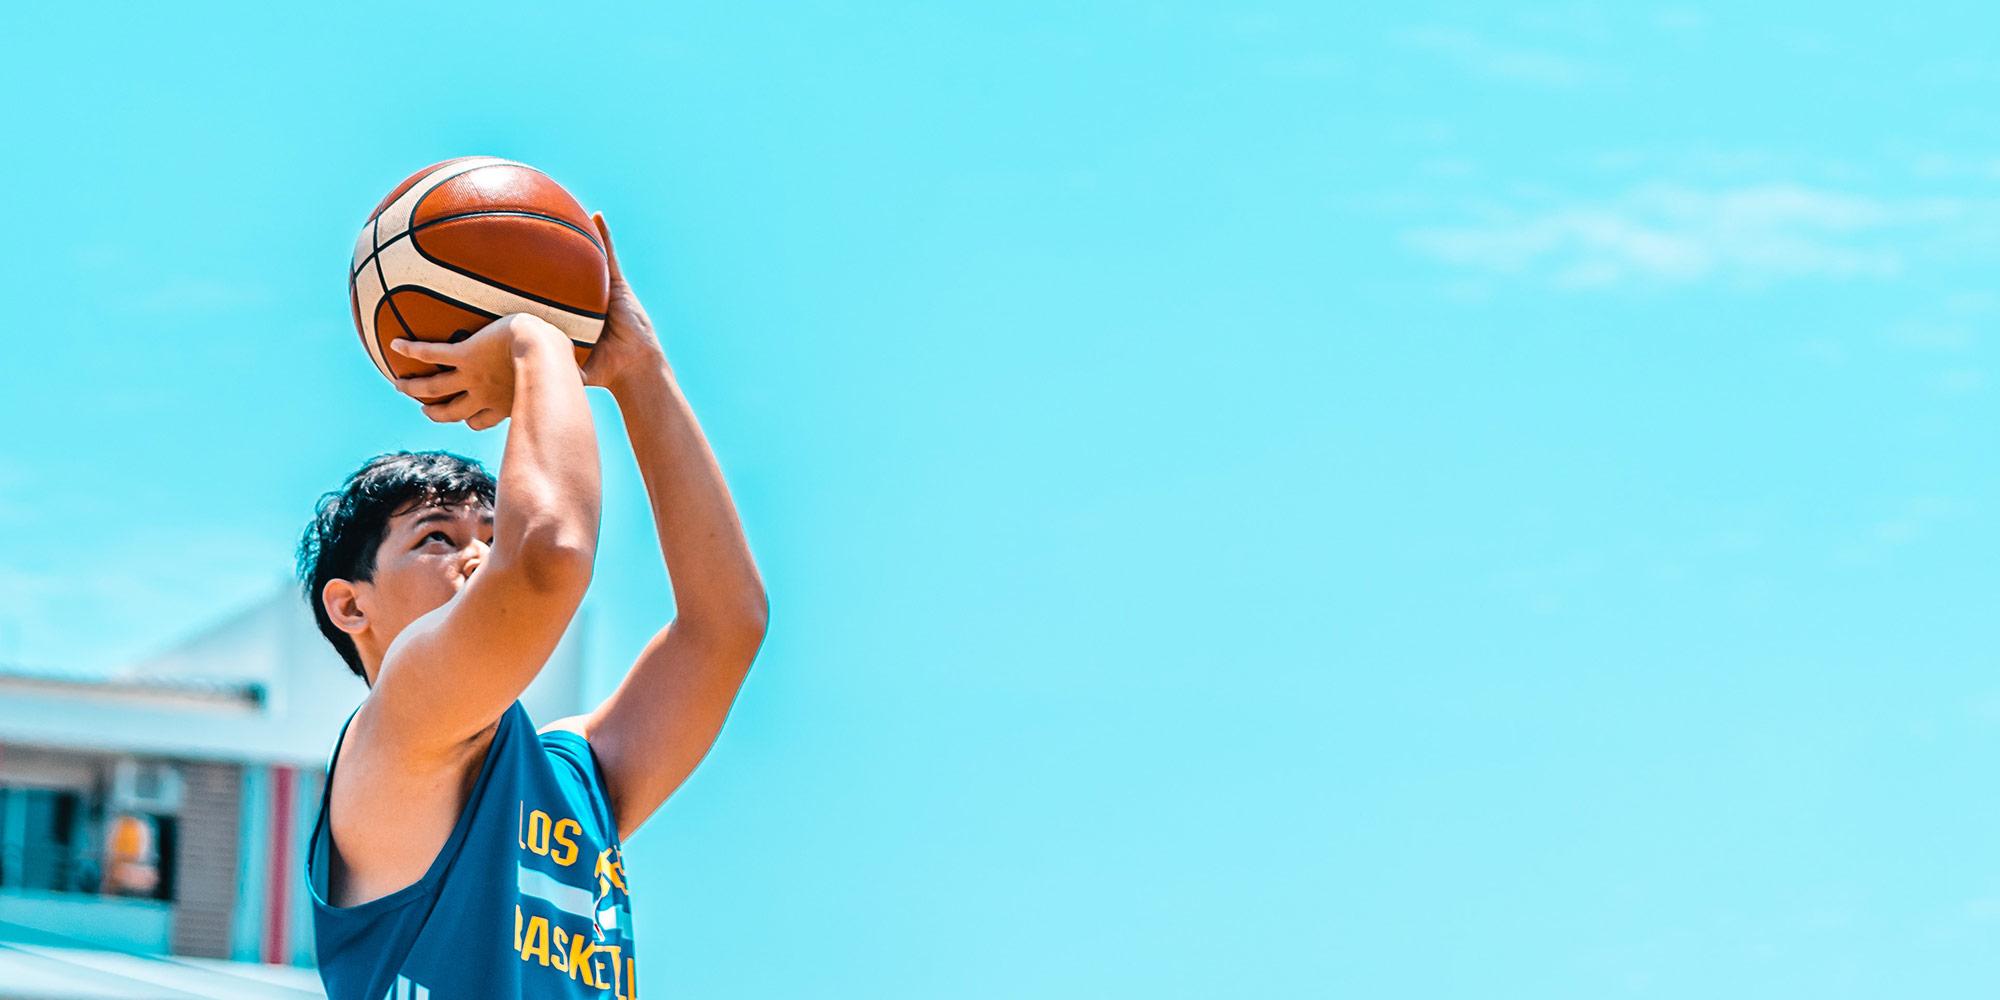 boy-playing-basketball